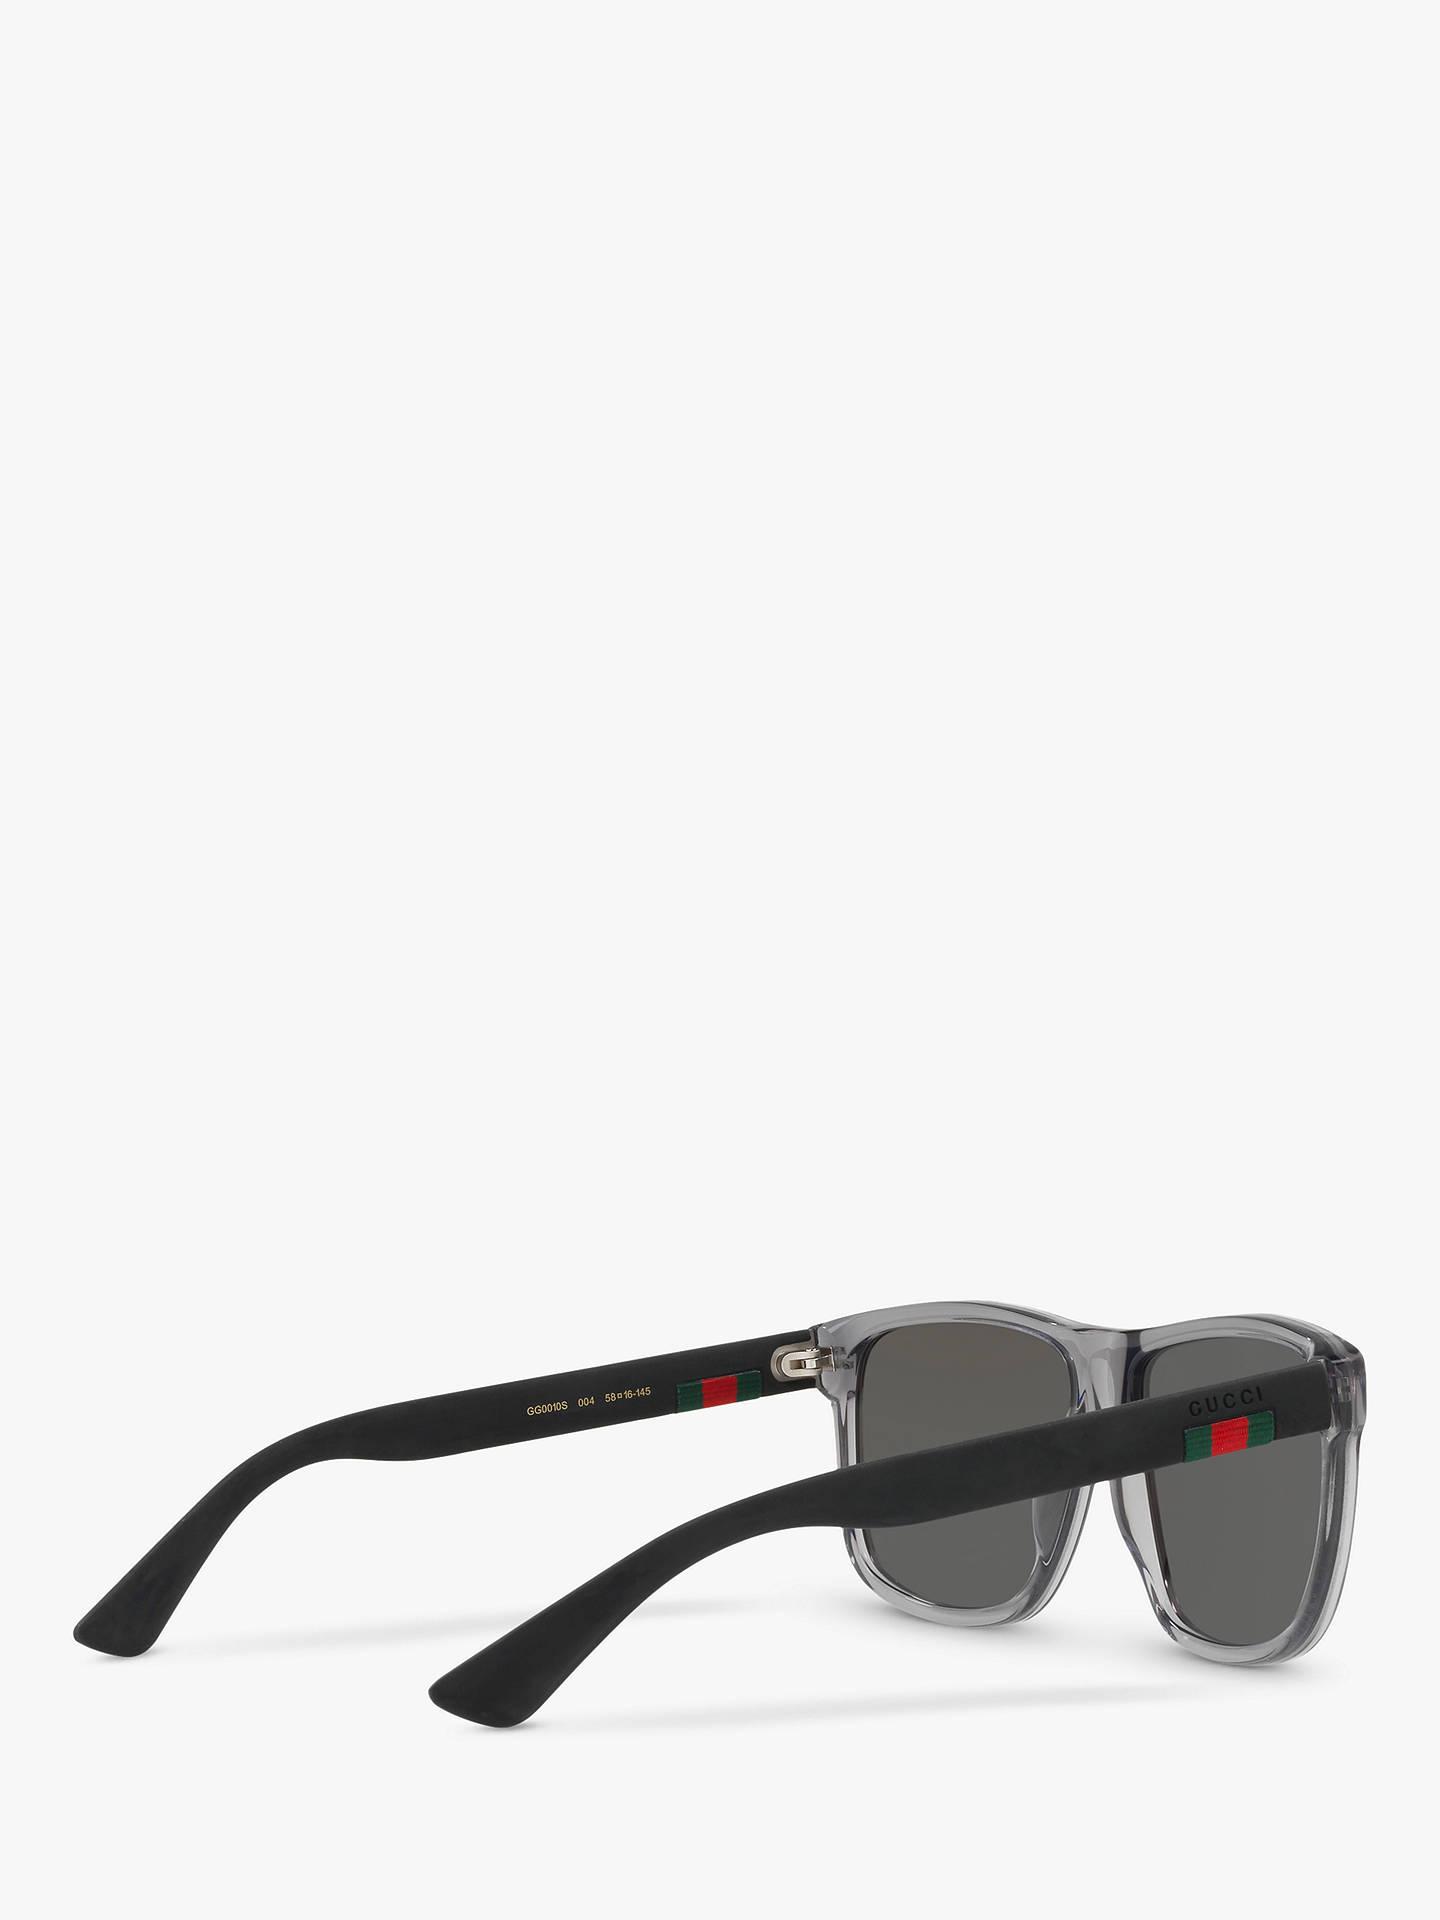 e7135ad742c Gucci GG0010S Polarised D-Frame Sunglasses at John Lewis   Partners